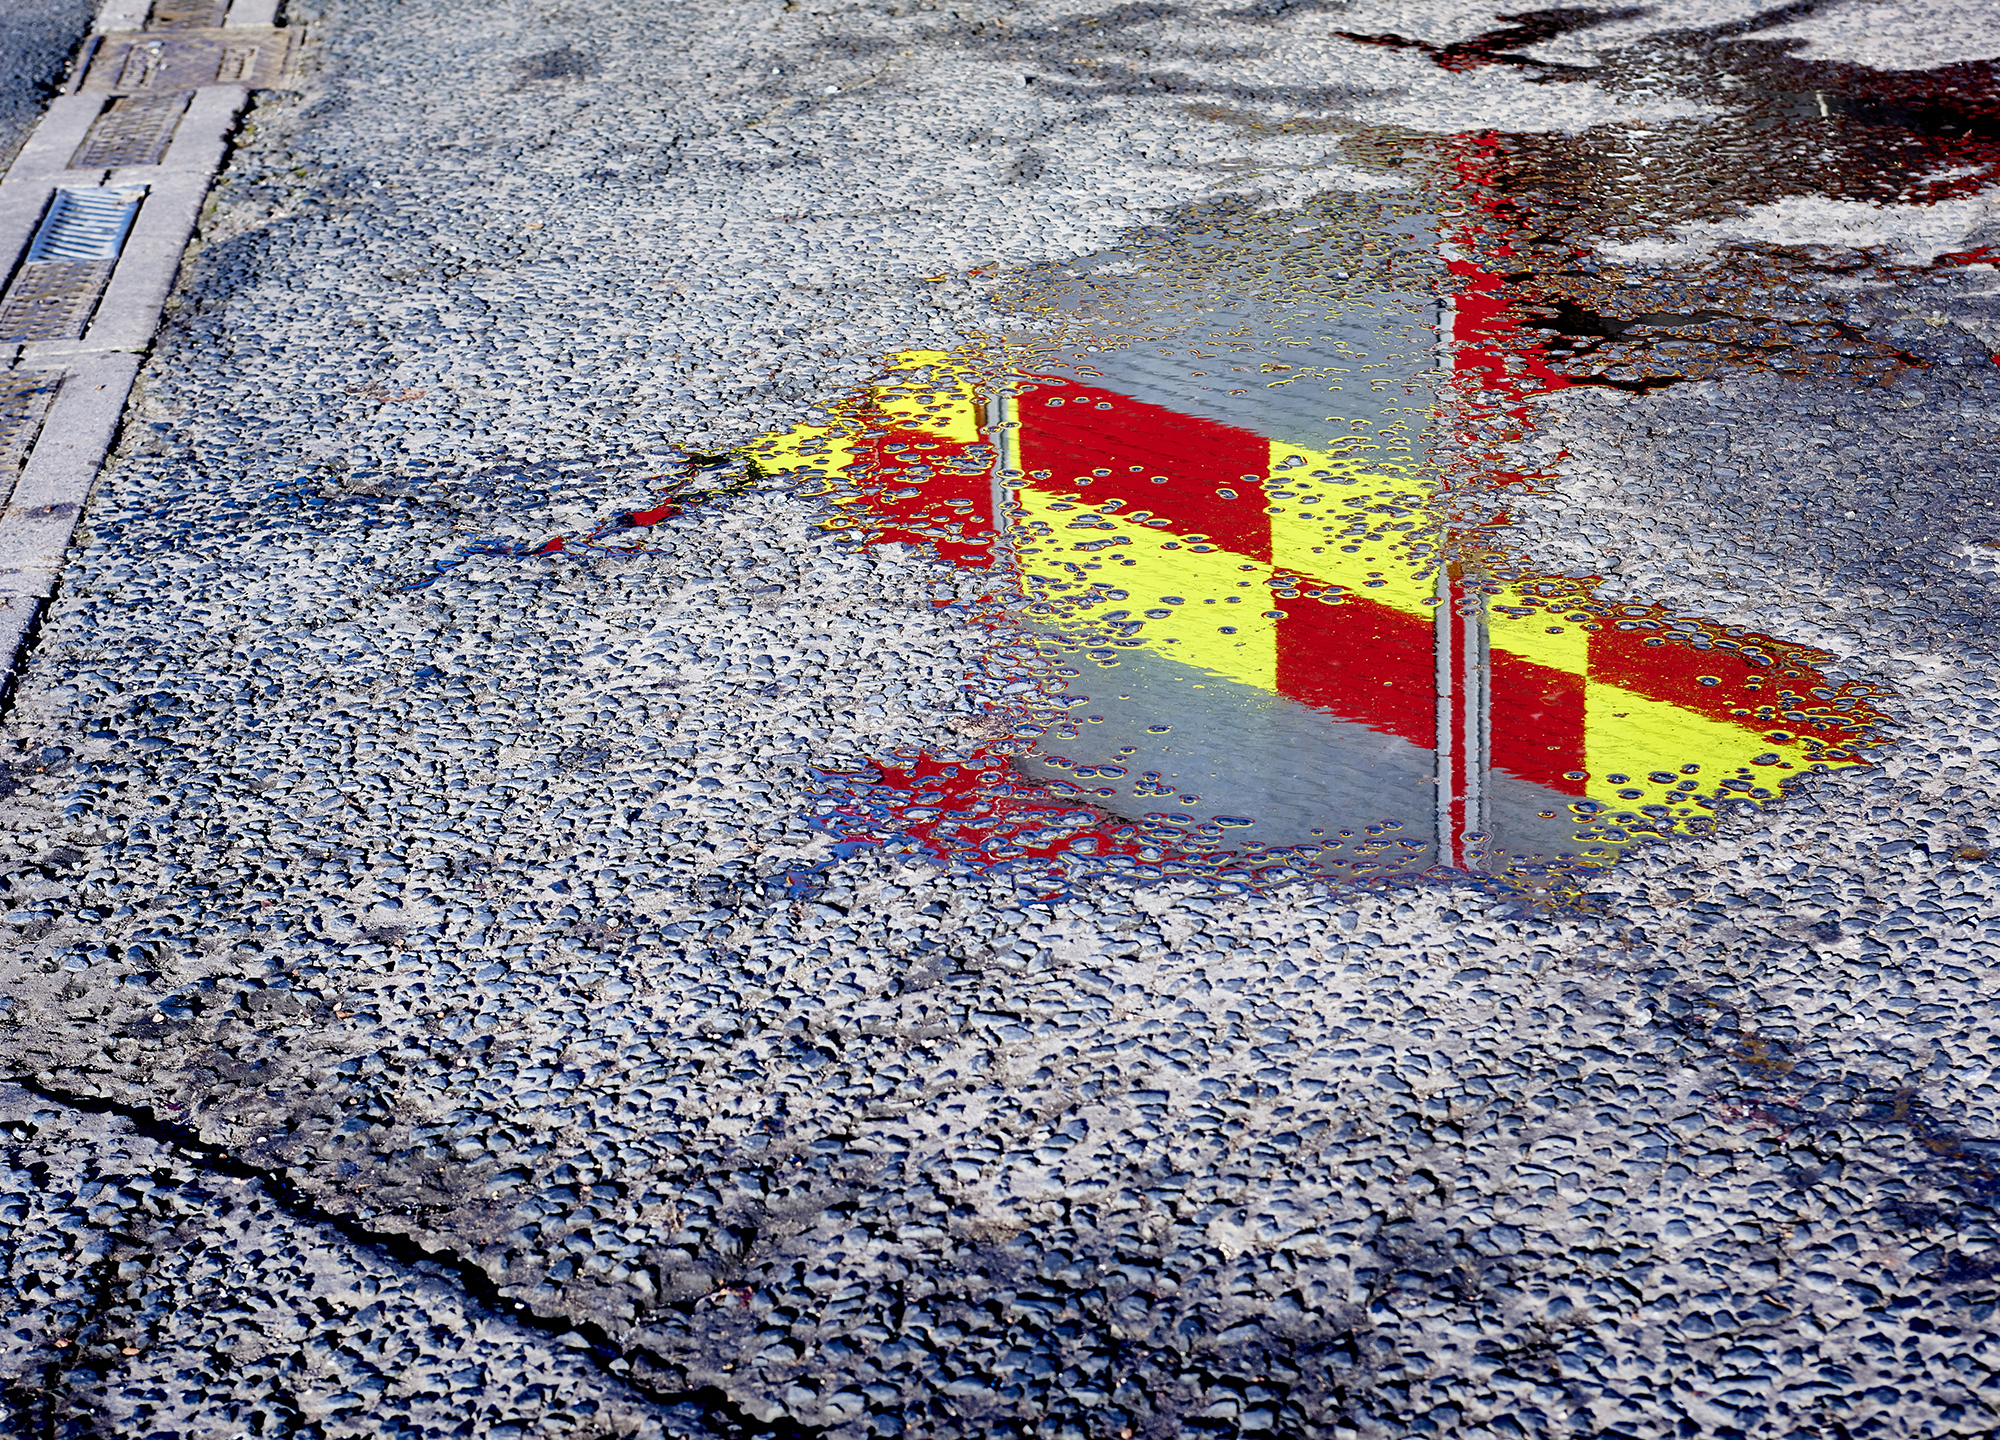 John Donoghue - puddle